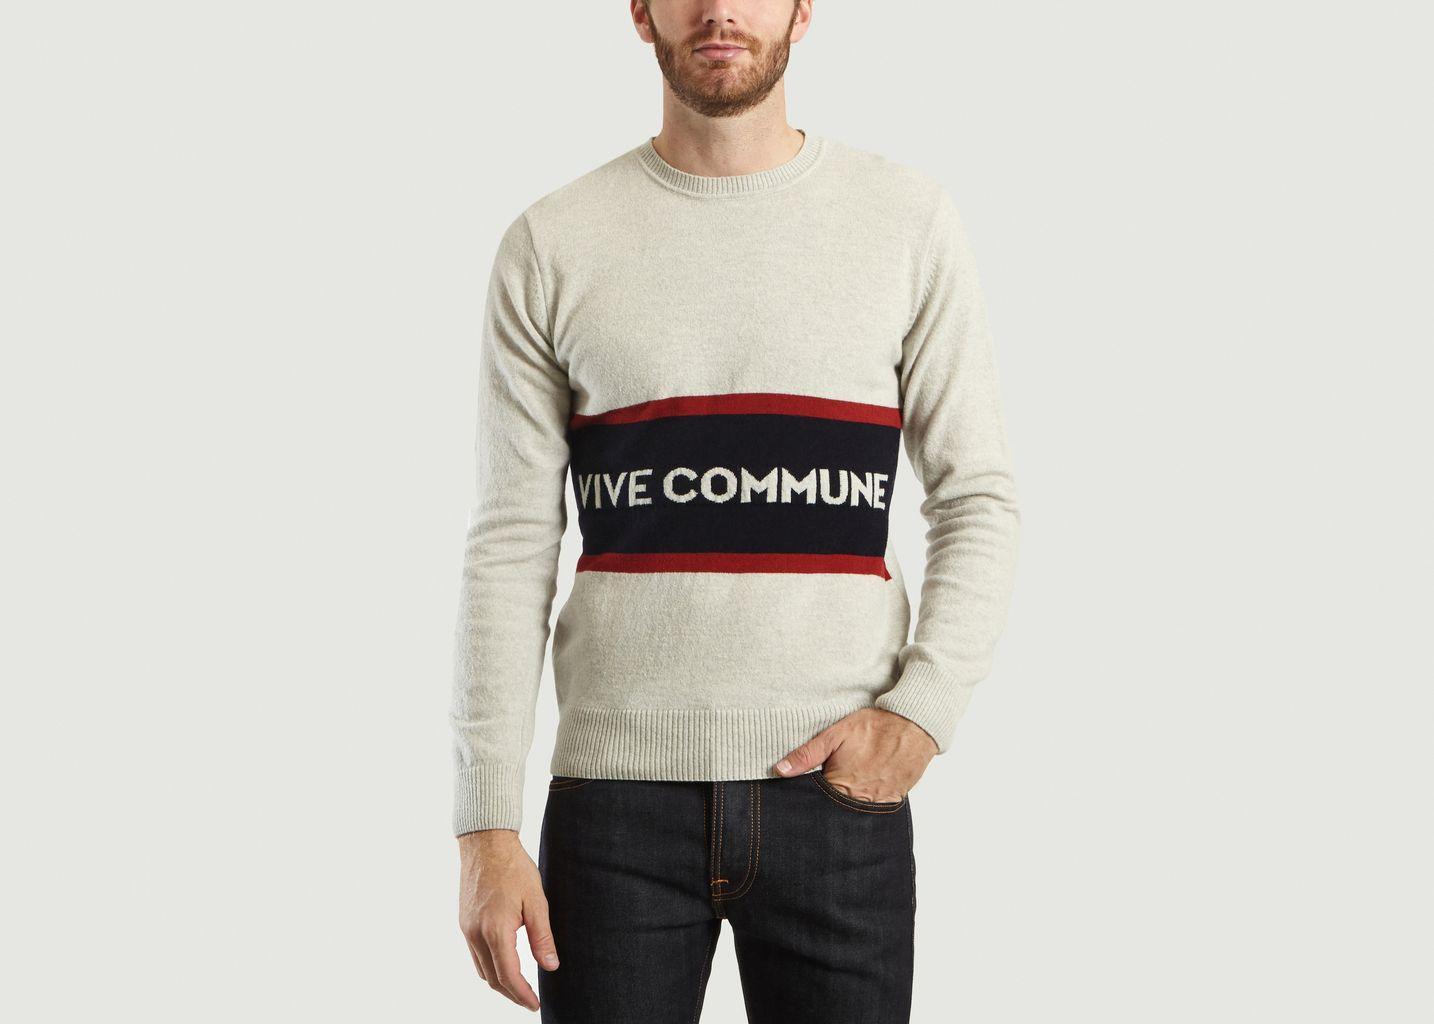 Pull Vive Commune - Commune de Paris